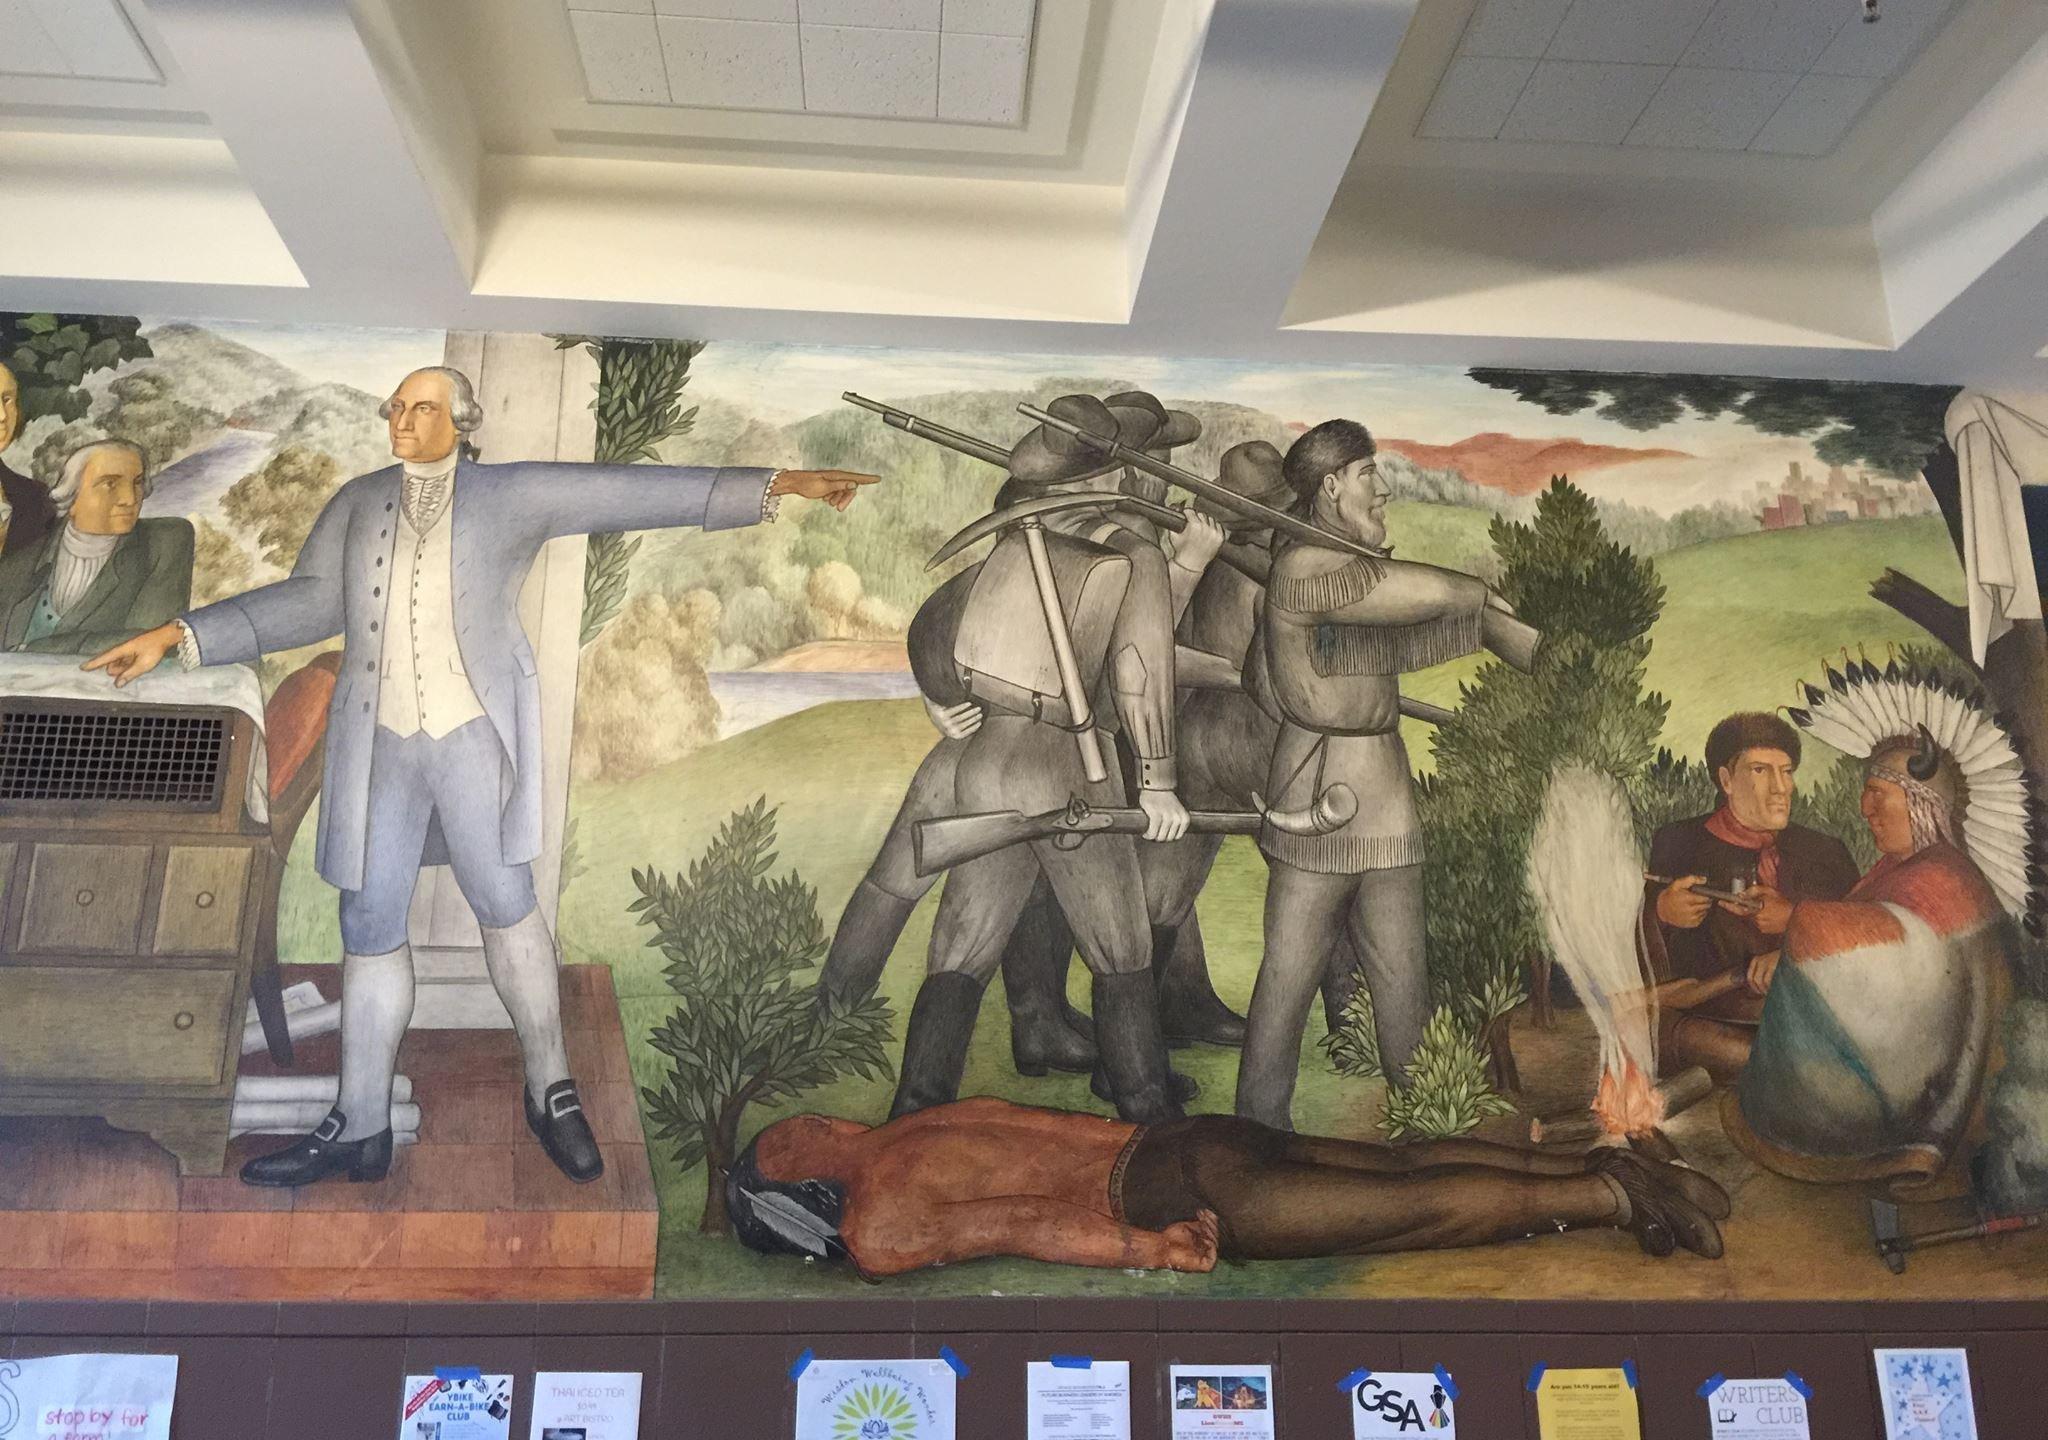 "The 1936-era fresco, ""Life of Washington"" mural is seen at George Washington High School in San Francisco on Jun 26, 2019. (Credit: Amy Anderson via CNN)"